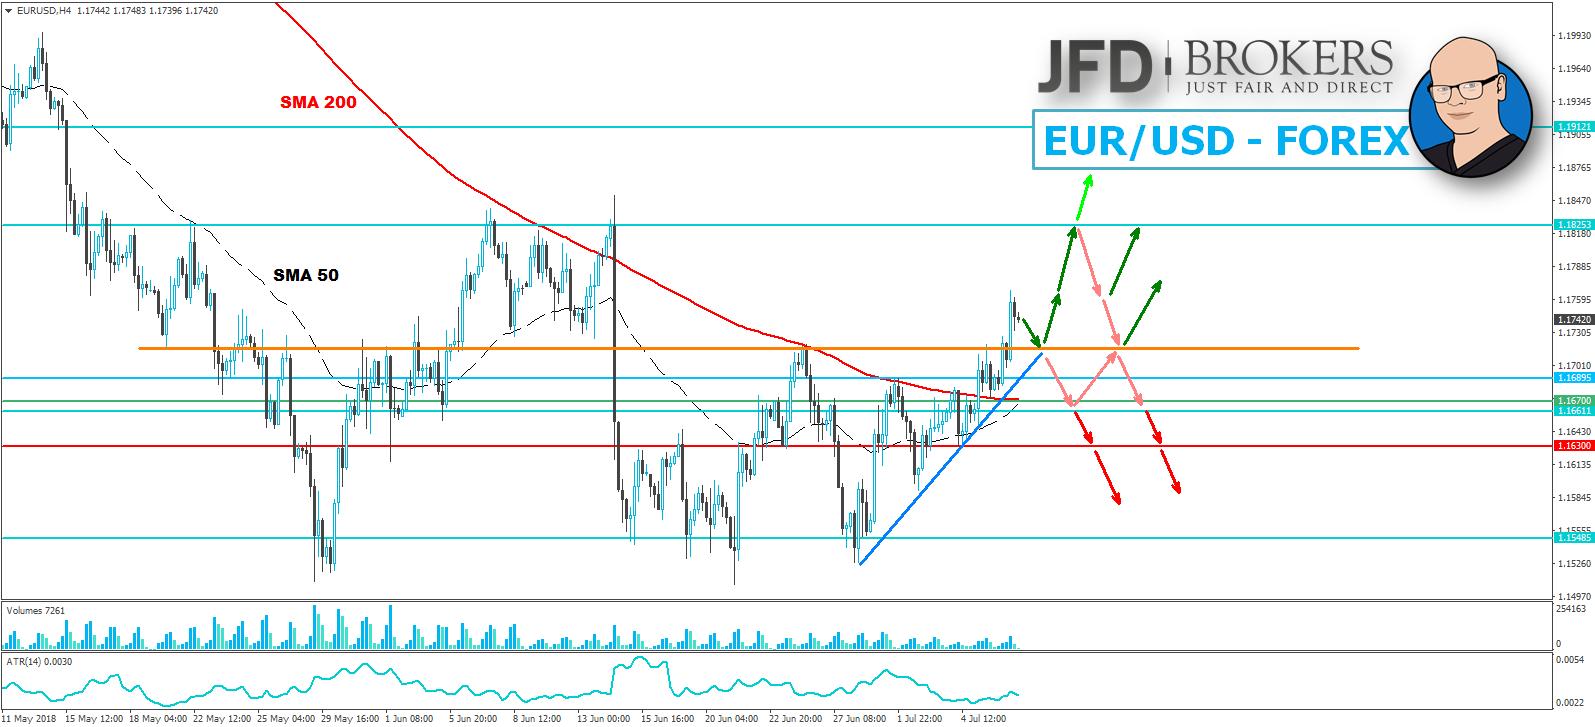 JFD-Wochenausblick-EUR-USD-GBP-USD-DAX-und-WTI-09-07-2018-13-07-2018-Kommentar-JFD-Brokers-GodmodeTrader.de-1